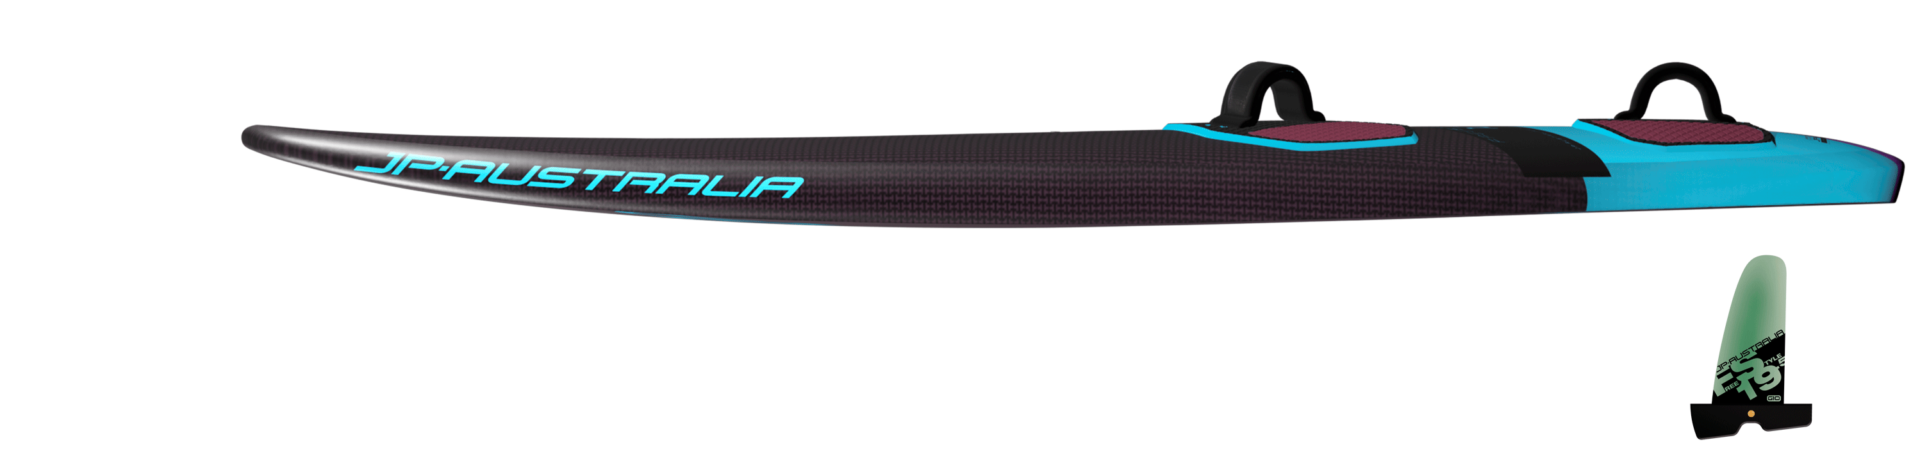 JP Australia Freestyle Pro 2020